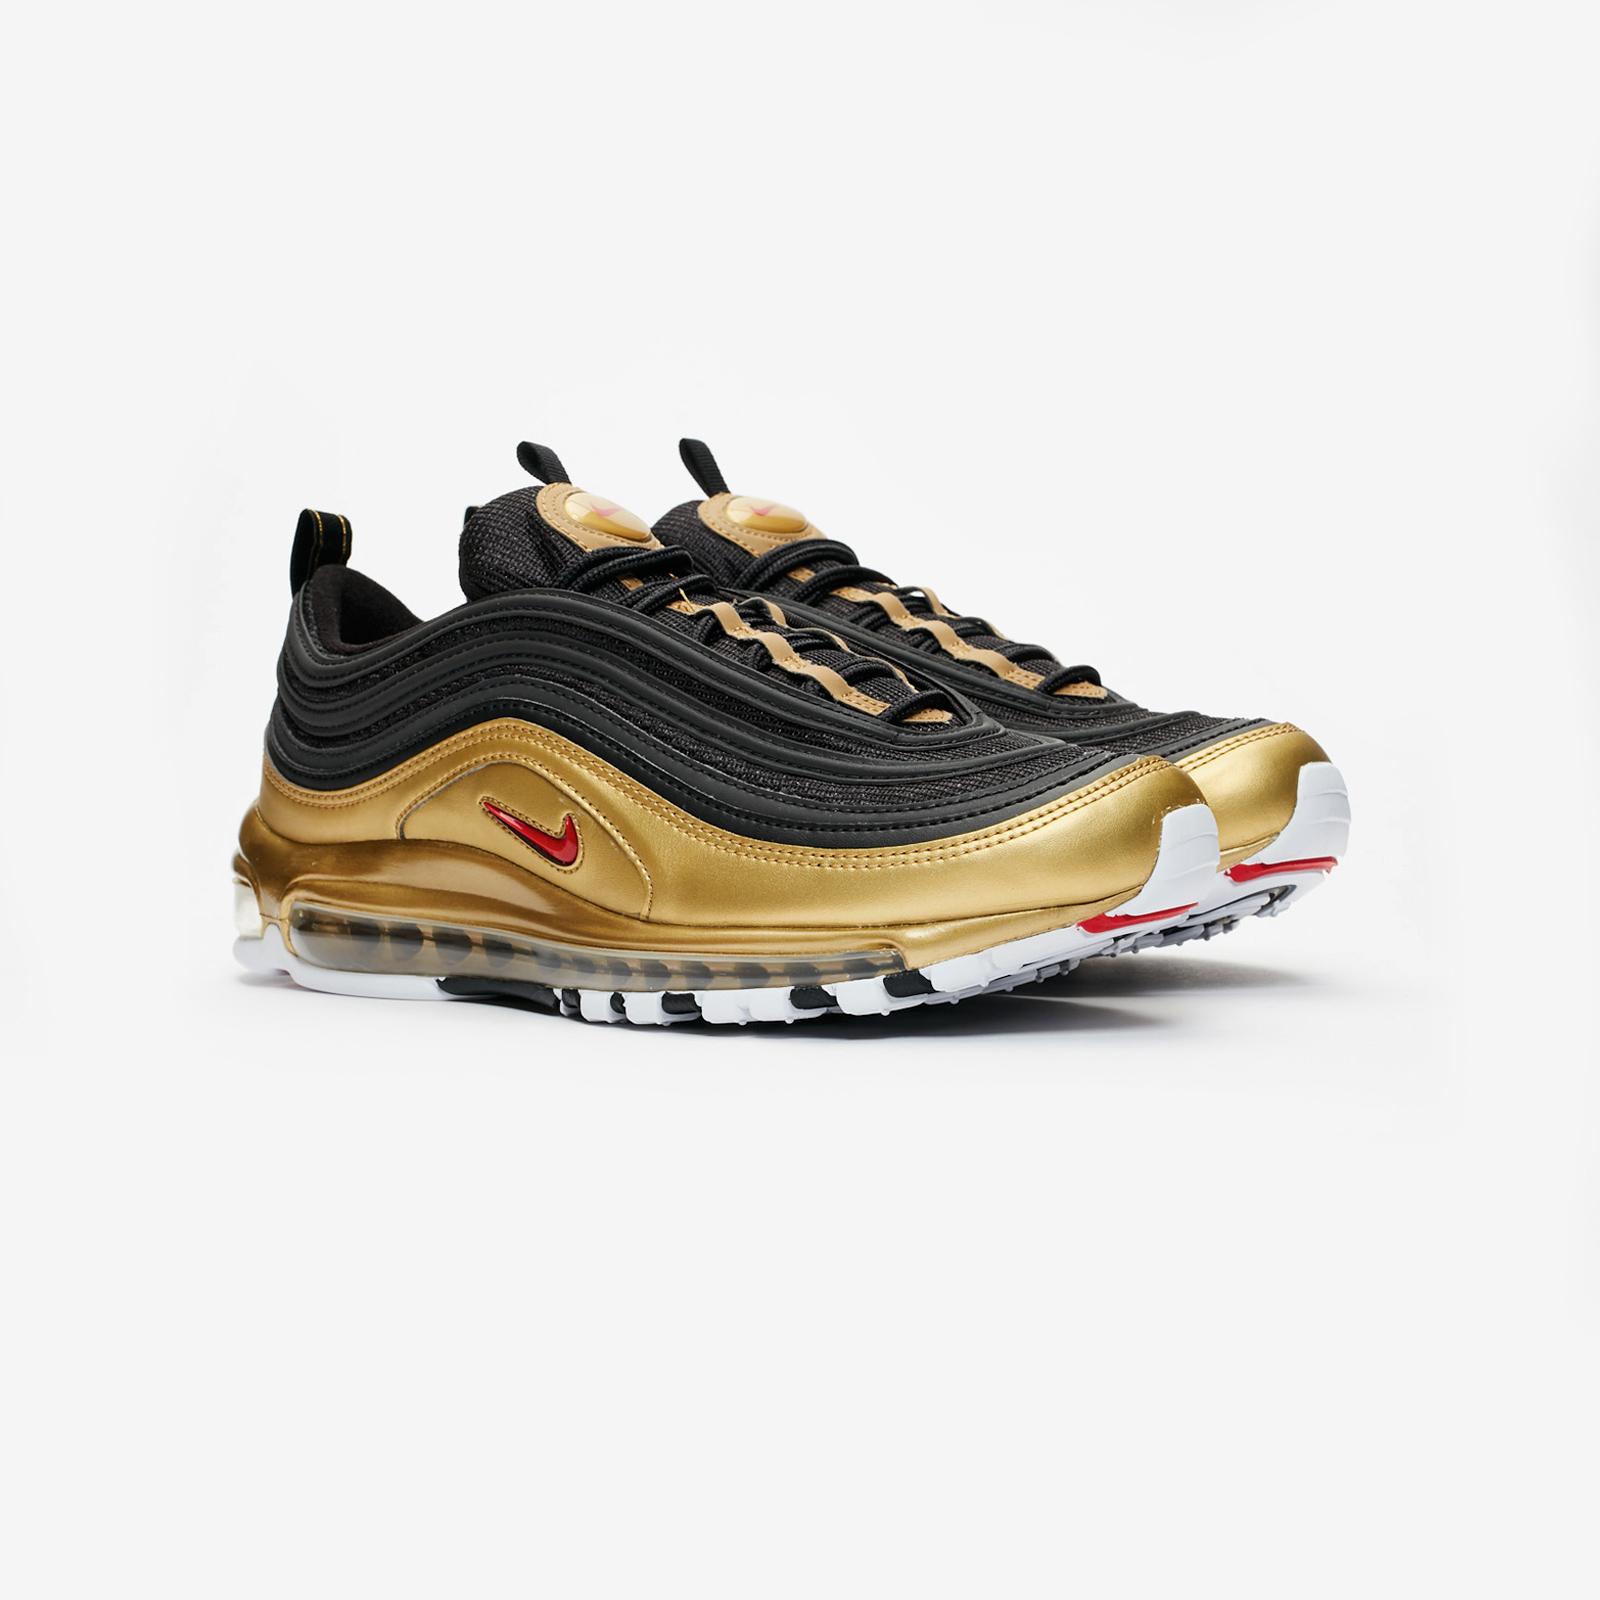 Nike Air Max 97 QS - At5458-002 - Sneakersnstuff  87f134b5e